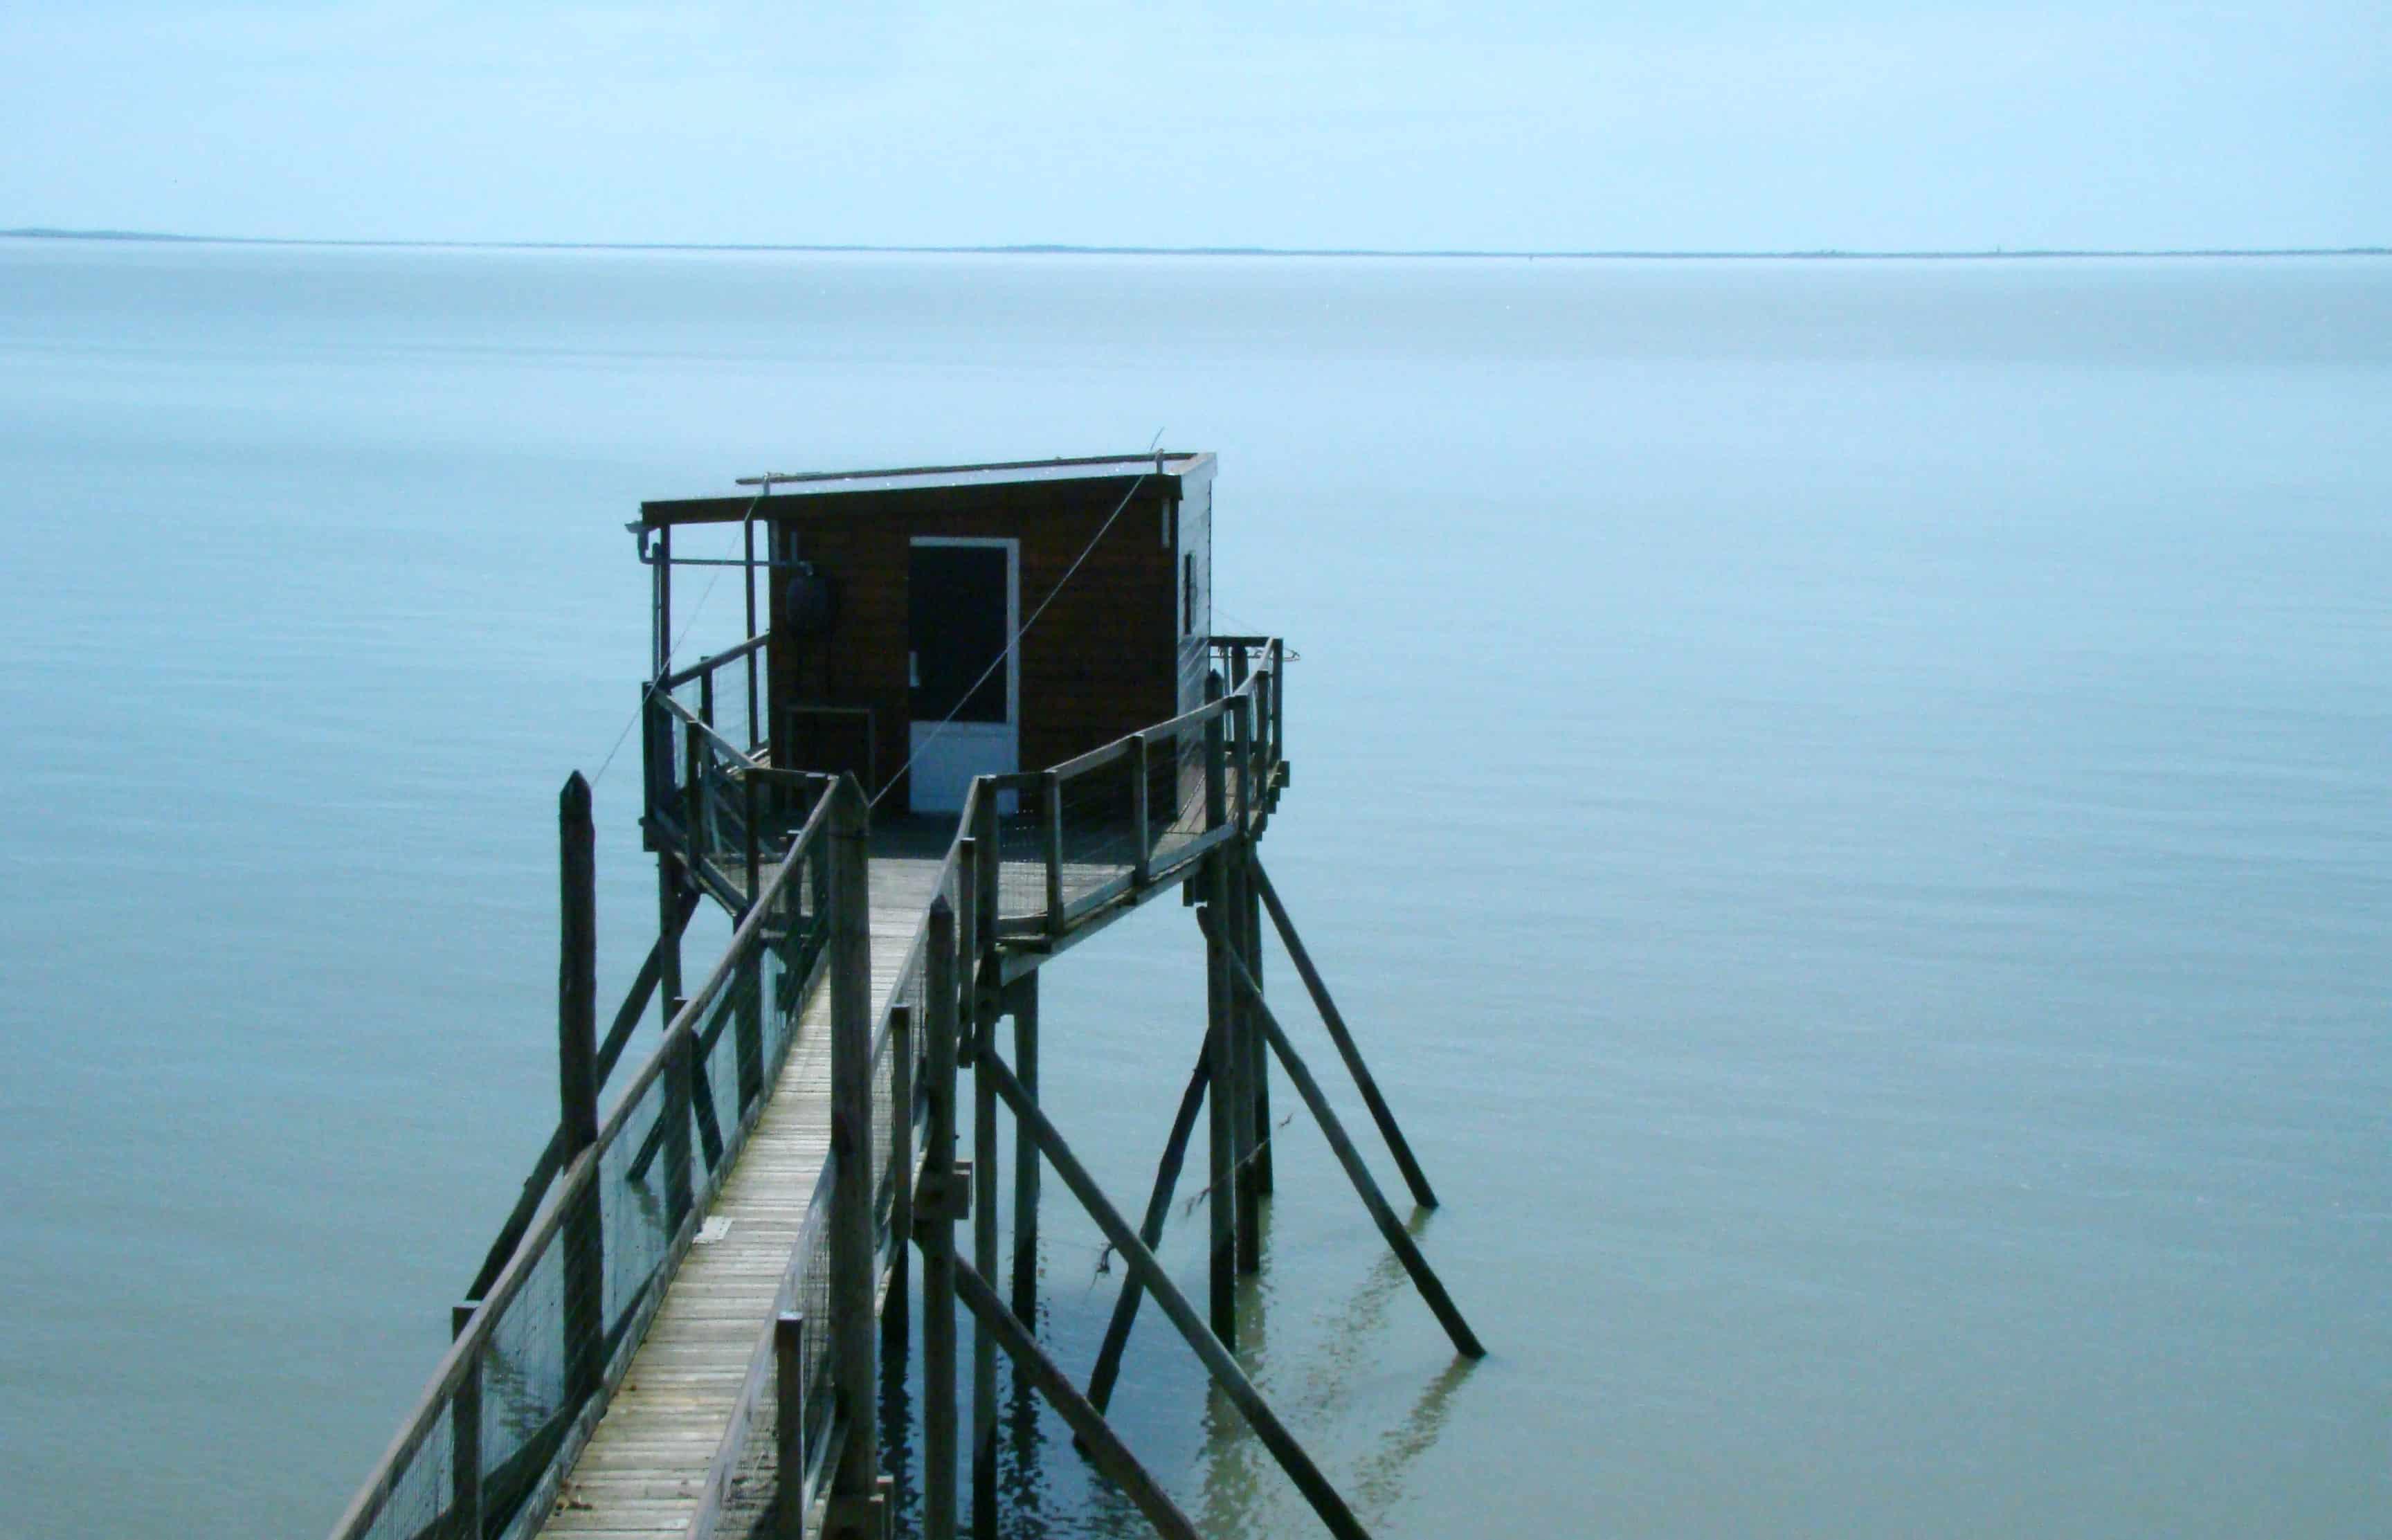 Carrelets de Port des Barques Charente-Maritime